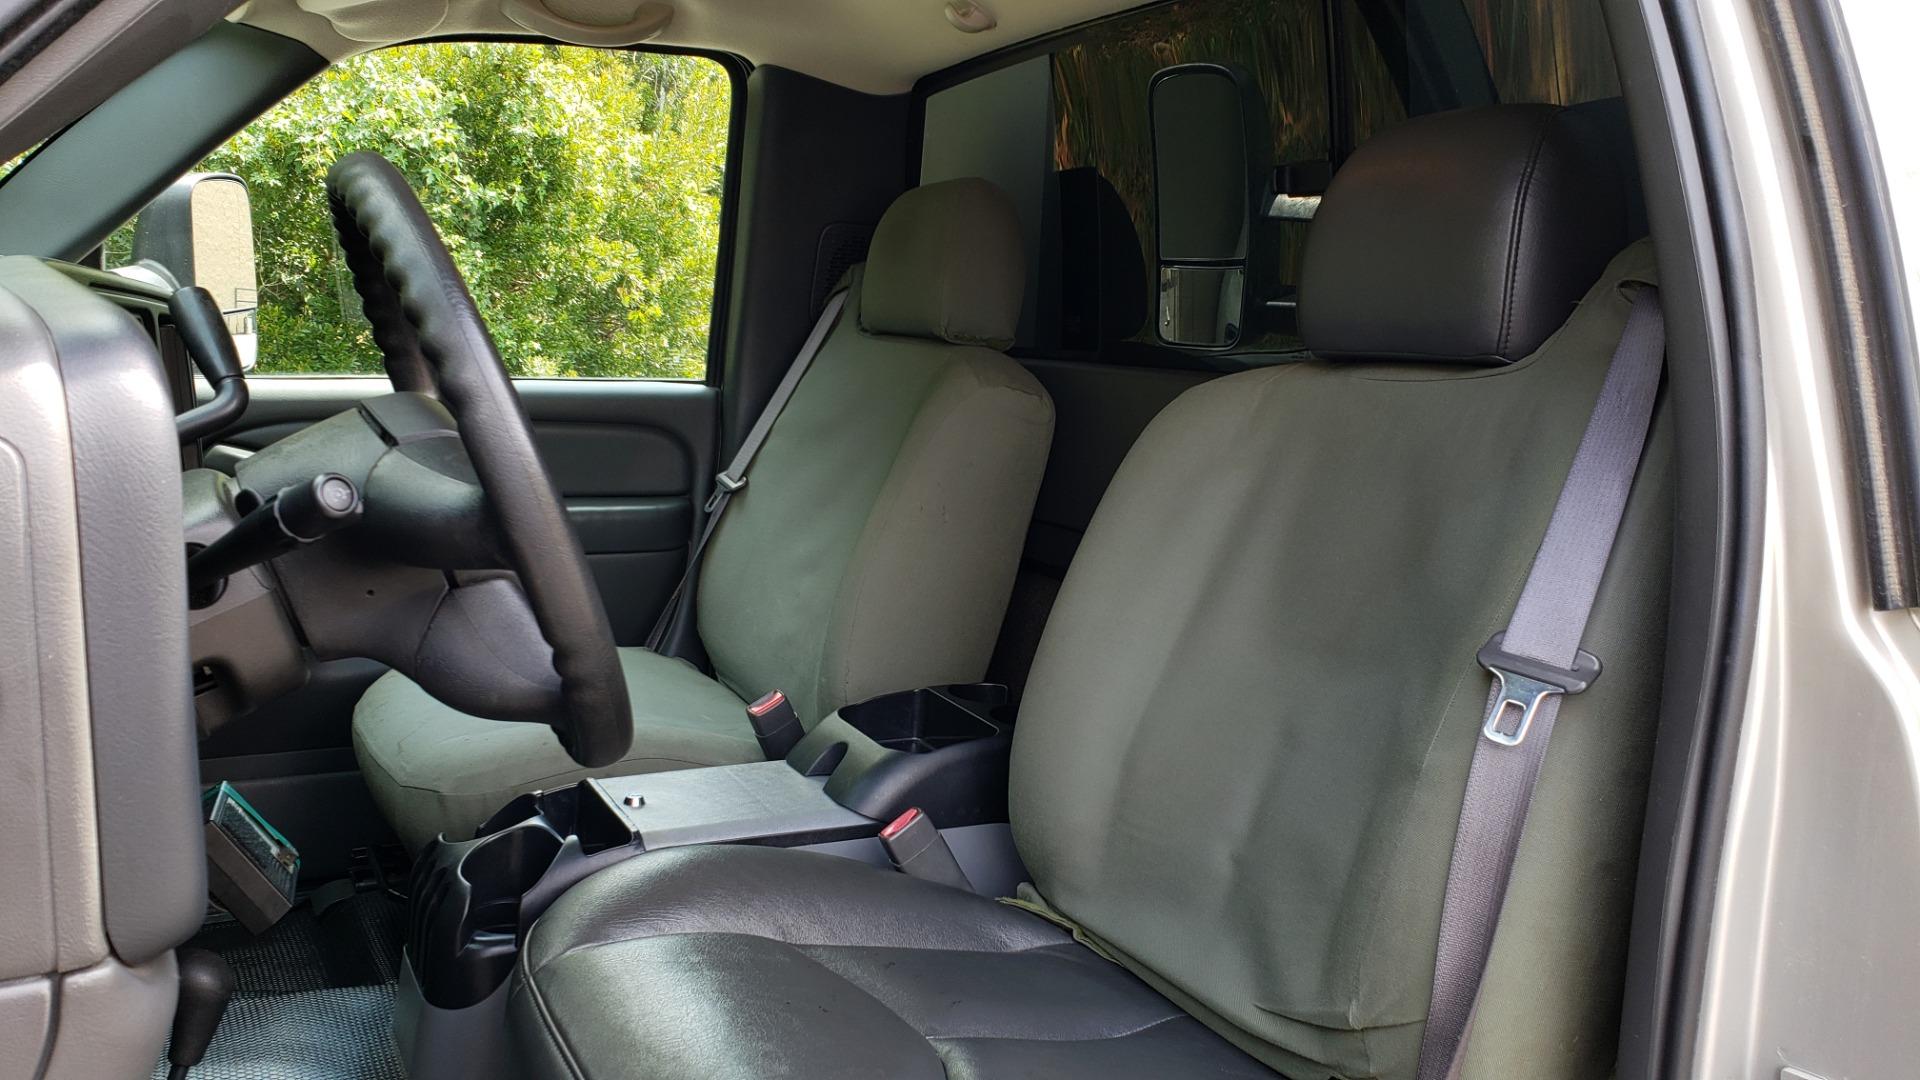 Used 2005 Chevrolet SILVERADO 3500 DRW / 4WD / REG CAB / 6.6L DURAMAX / DOOMSDAY PREPPER for sale $21,595 at Formula Imports in Charlotte NC 28227 35